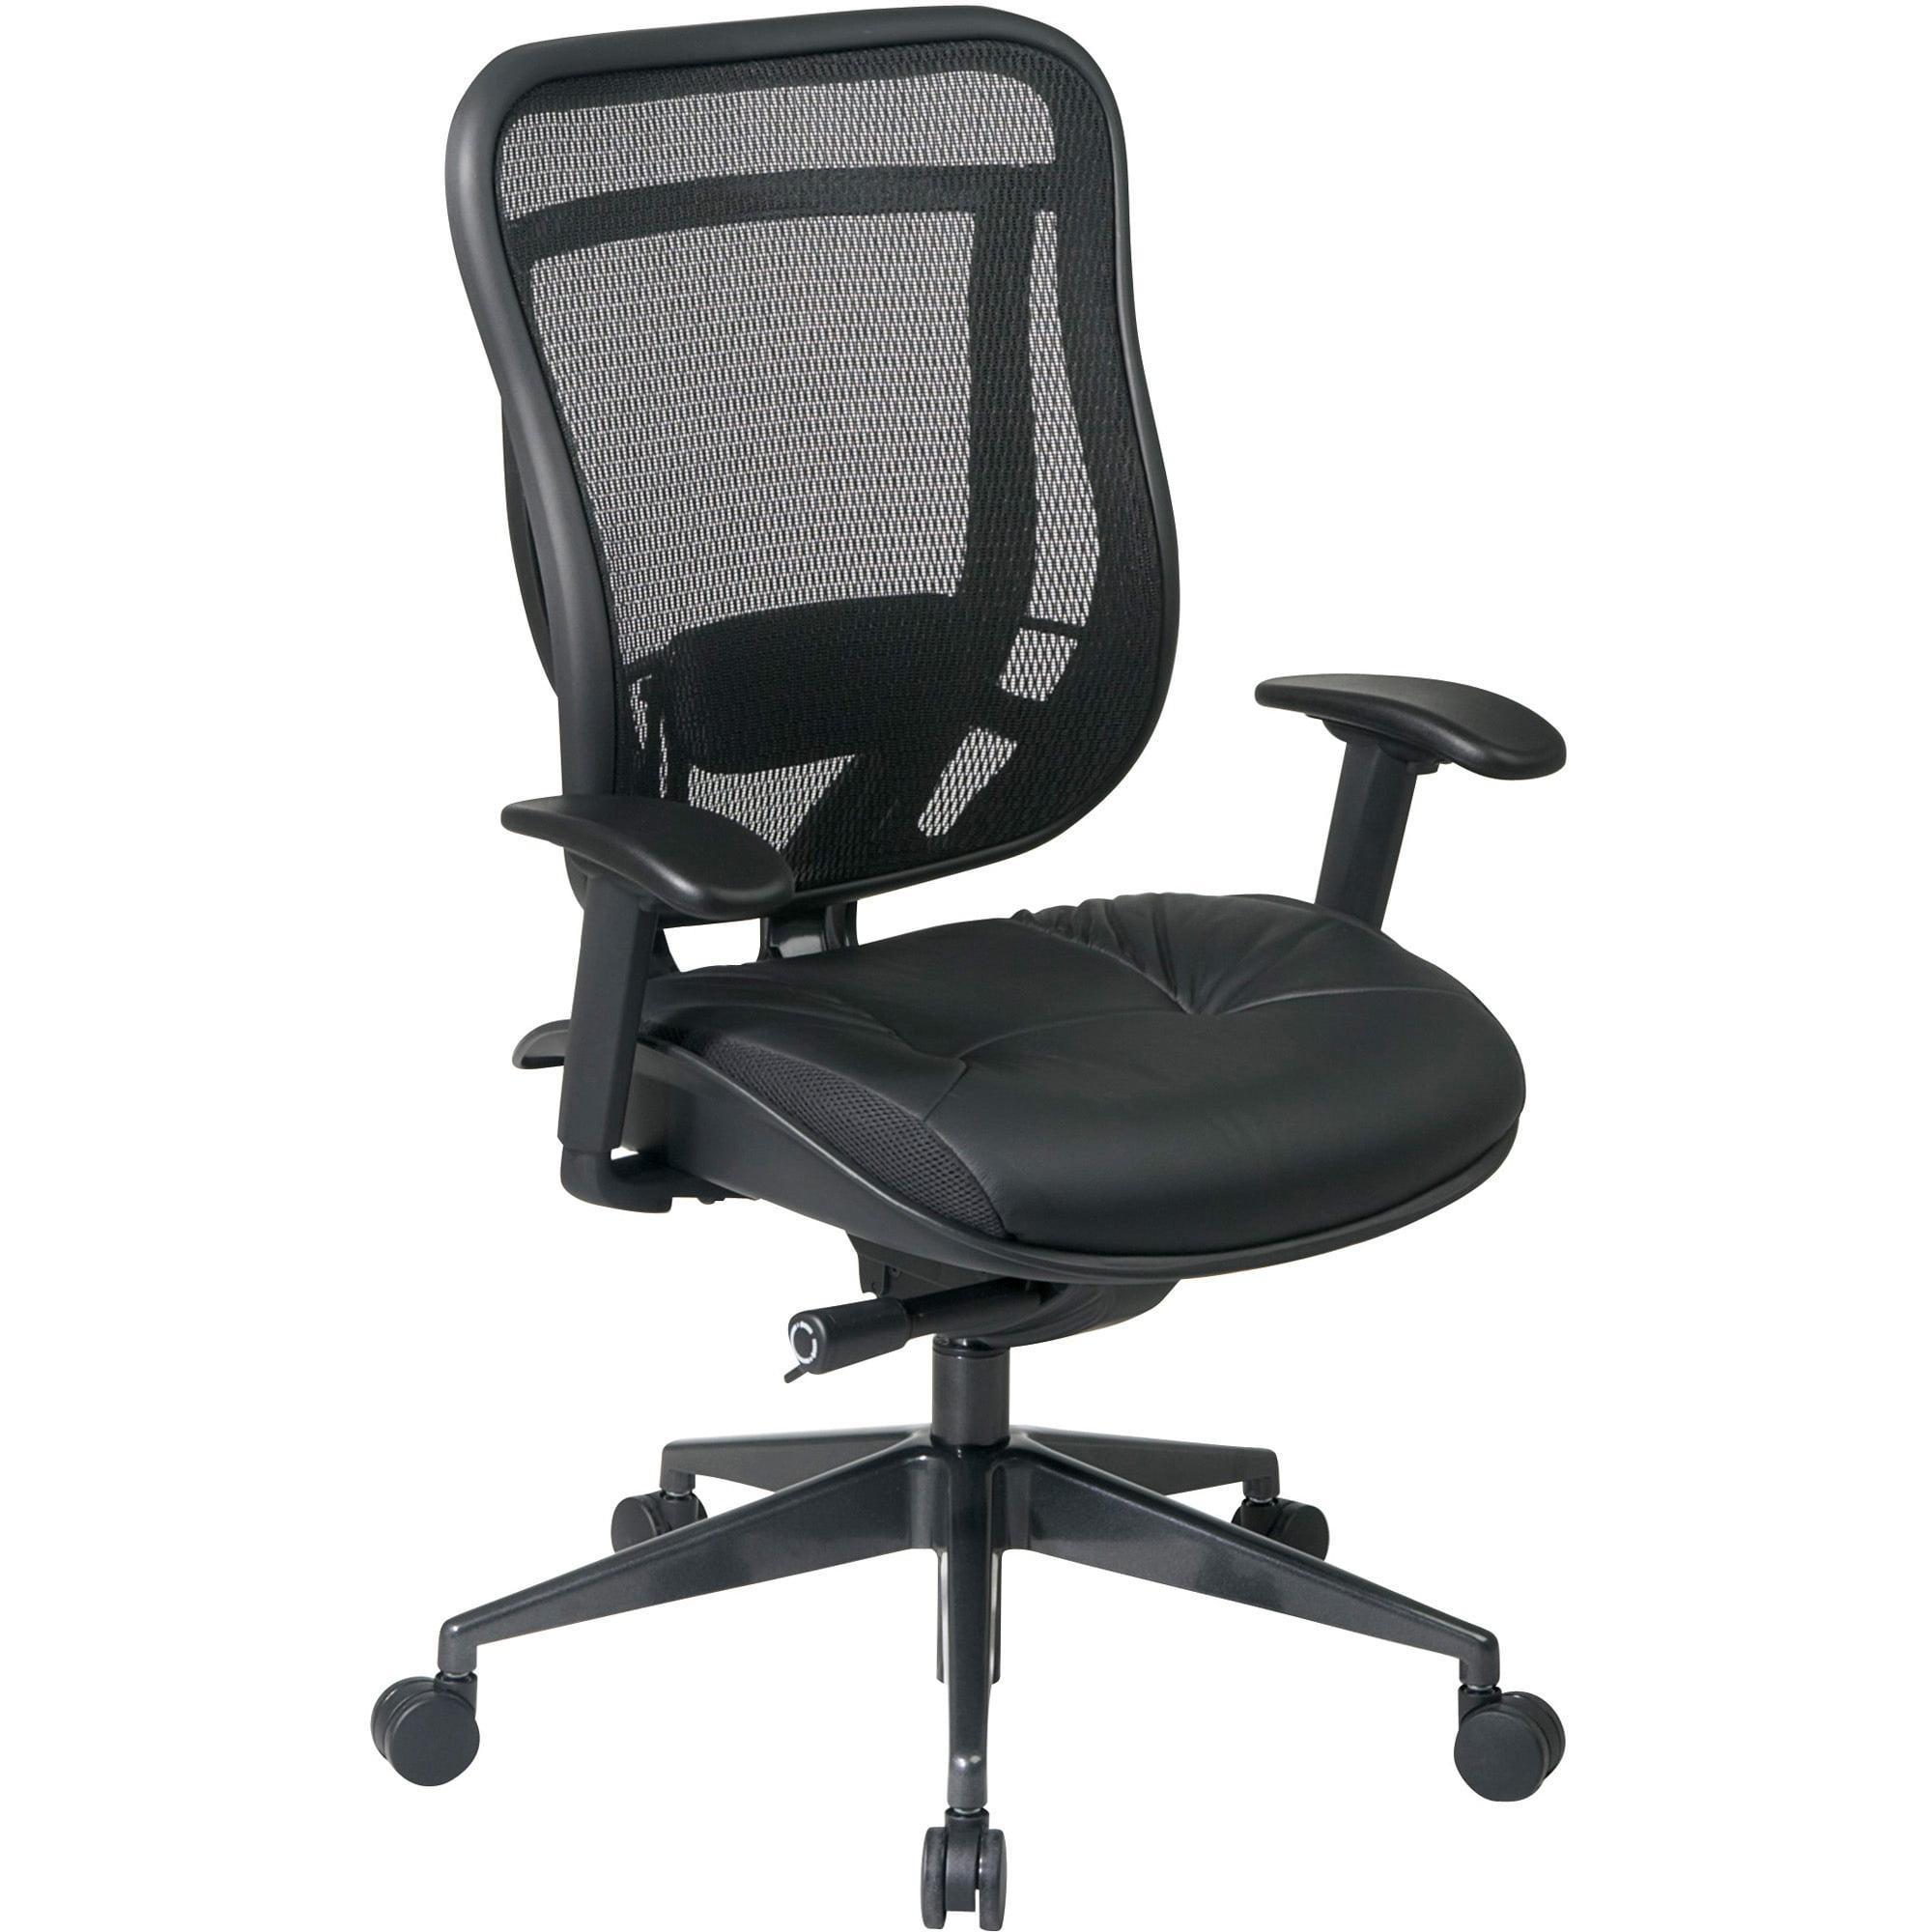 Office Star, OSP81841G9C18P, Mesh Back Executive Chair, 1 Each, Black